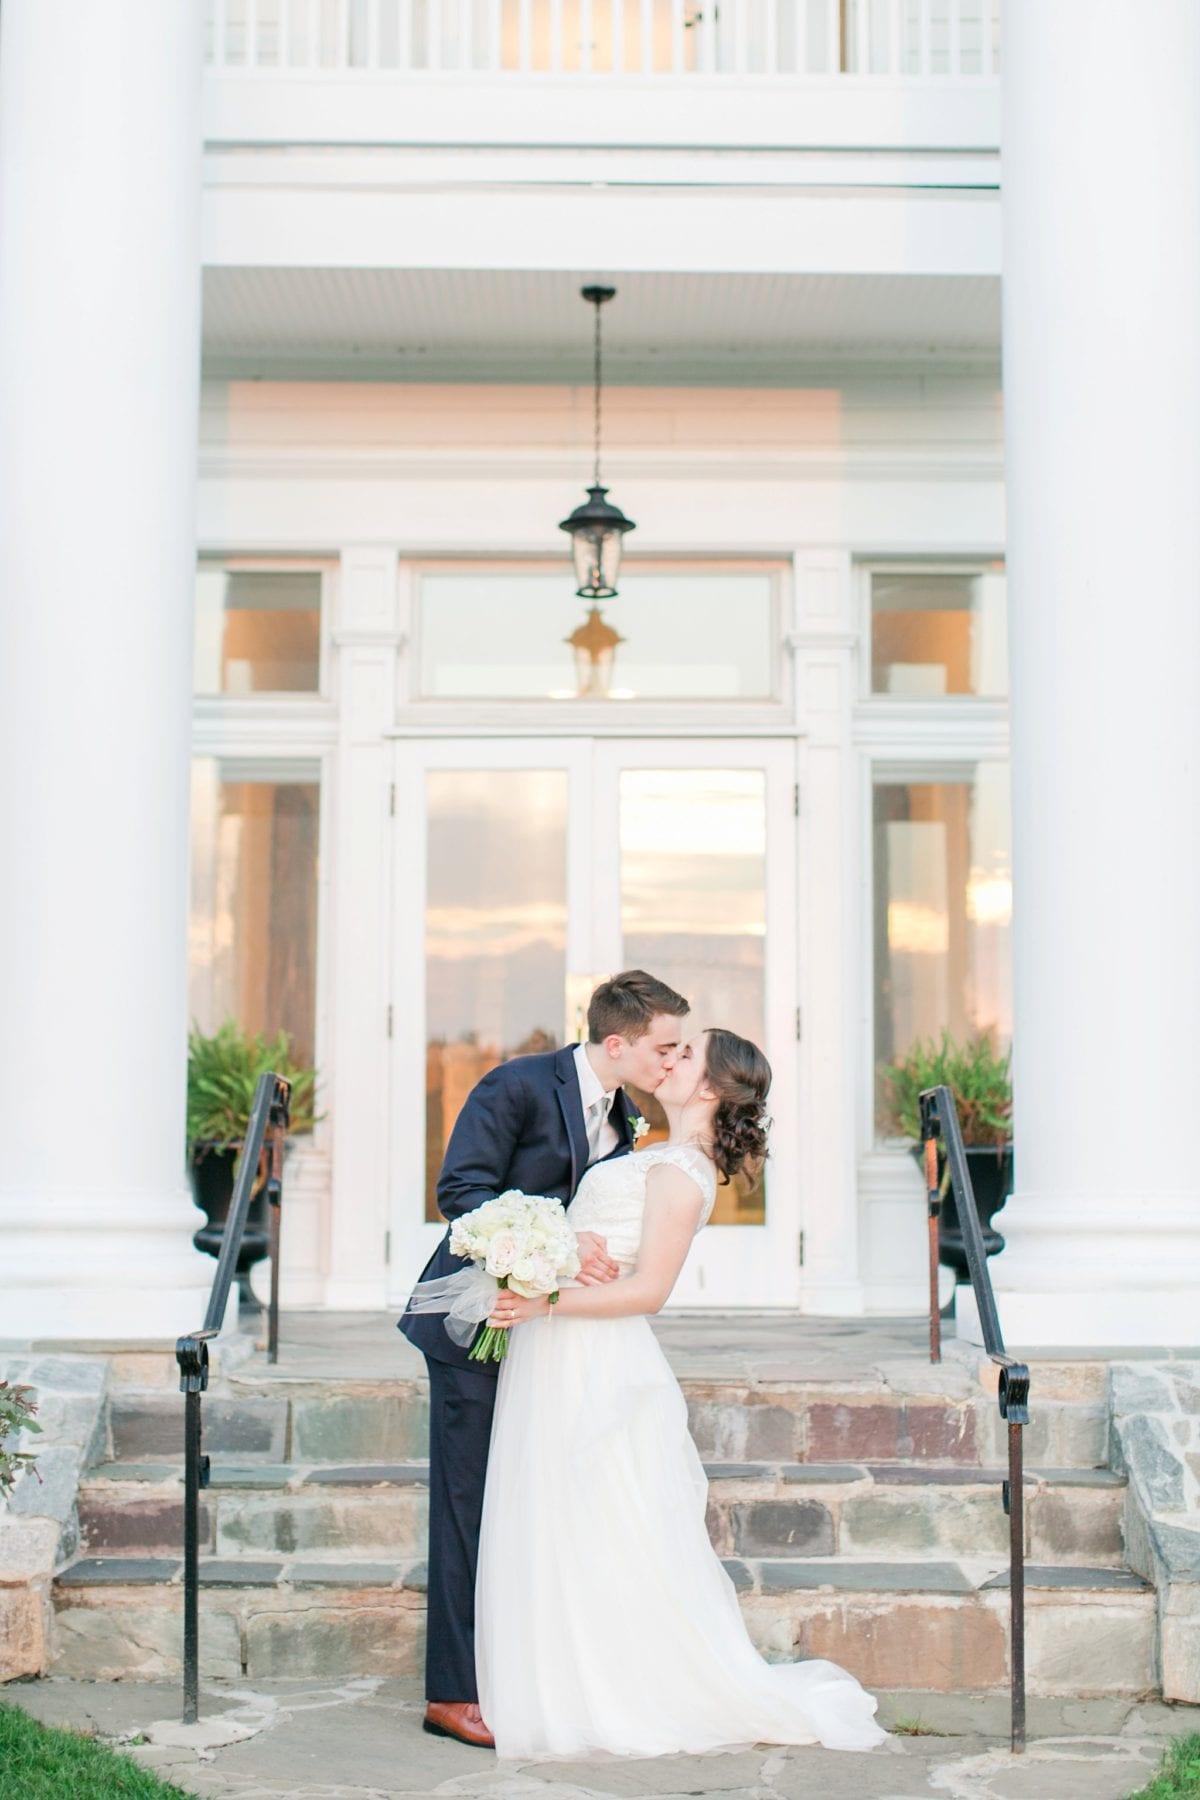 Bristow Manor Wedding Photos Virginia Wedding Photographer Lauren & Andrew Megan Kelsey Photography-617.jpg